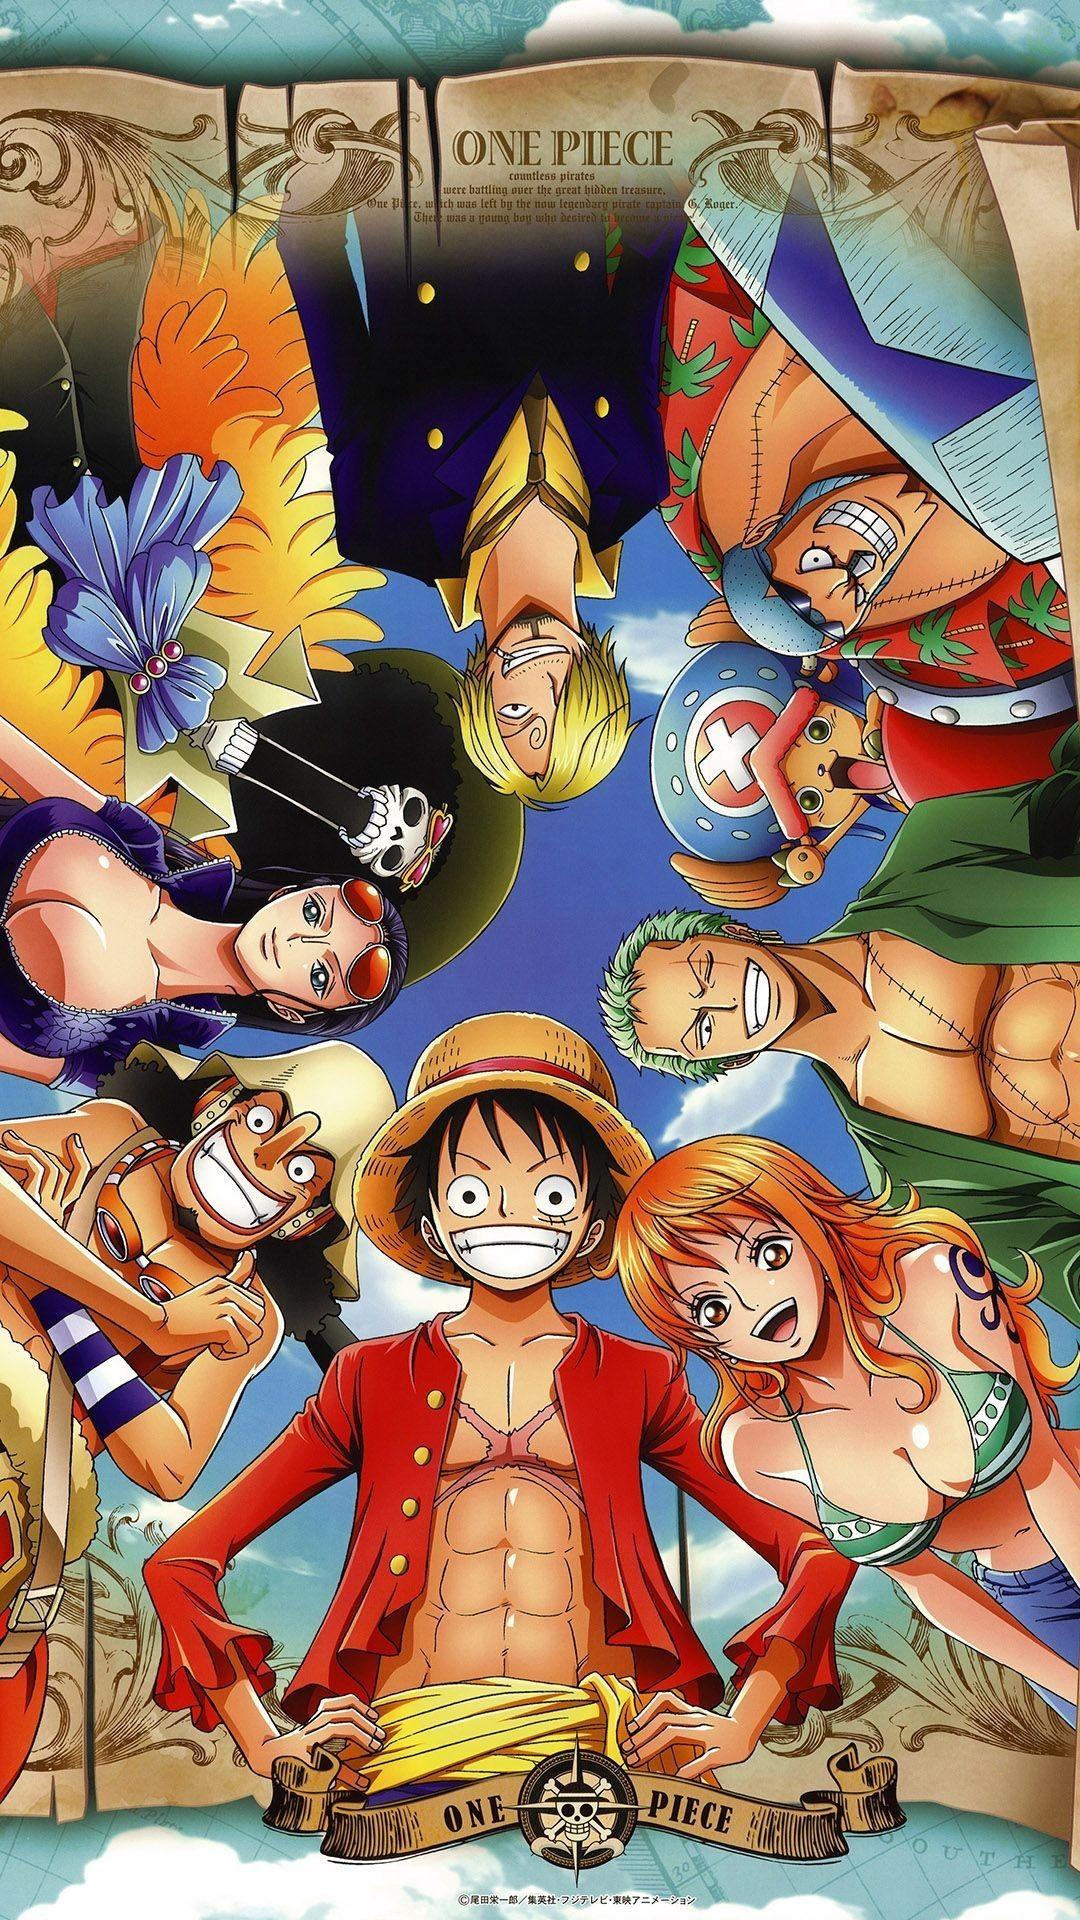 One Piece Chibi Wallpaper 1